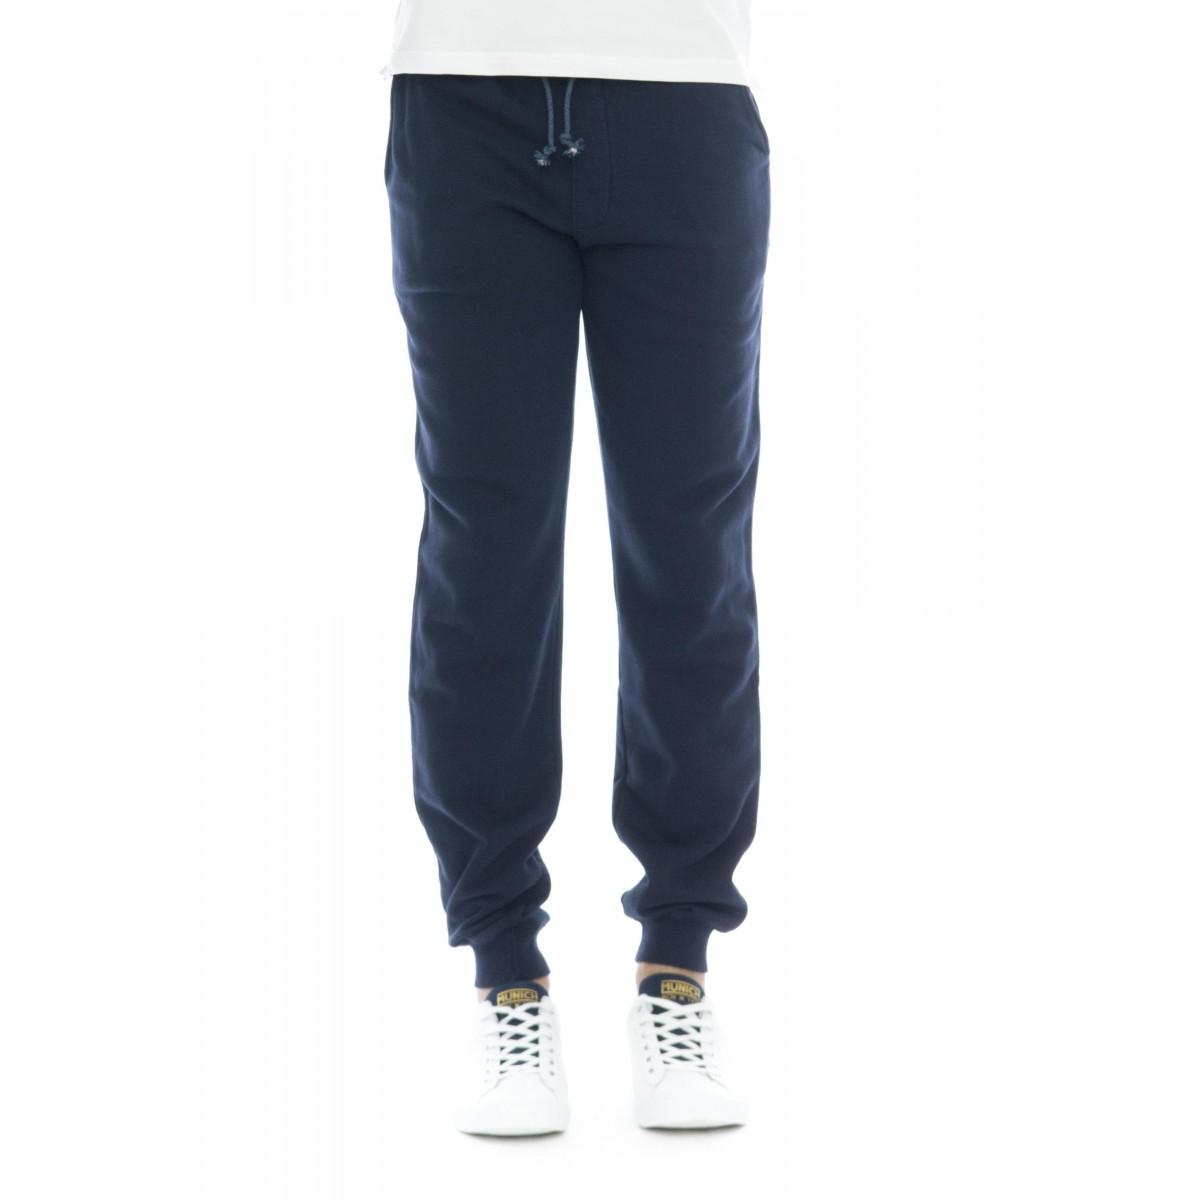 Pantalone uomo - F19126 pantalone jogging